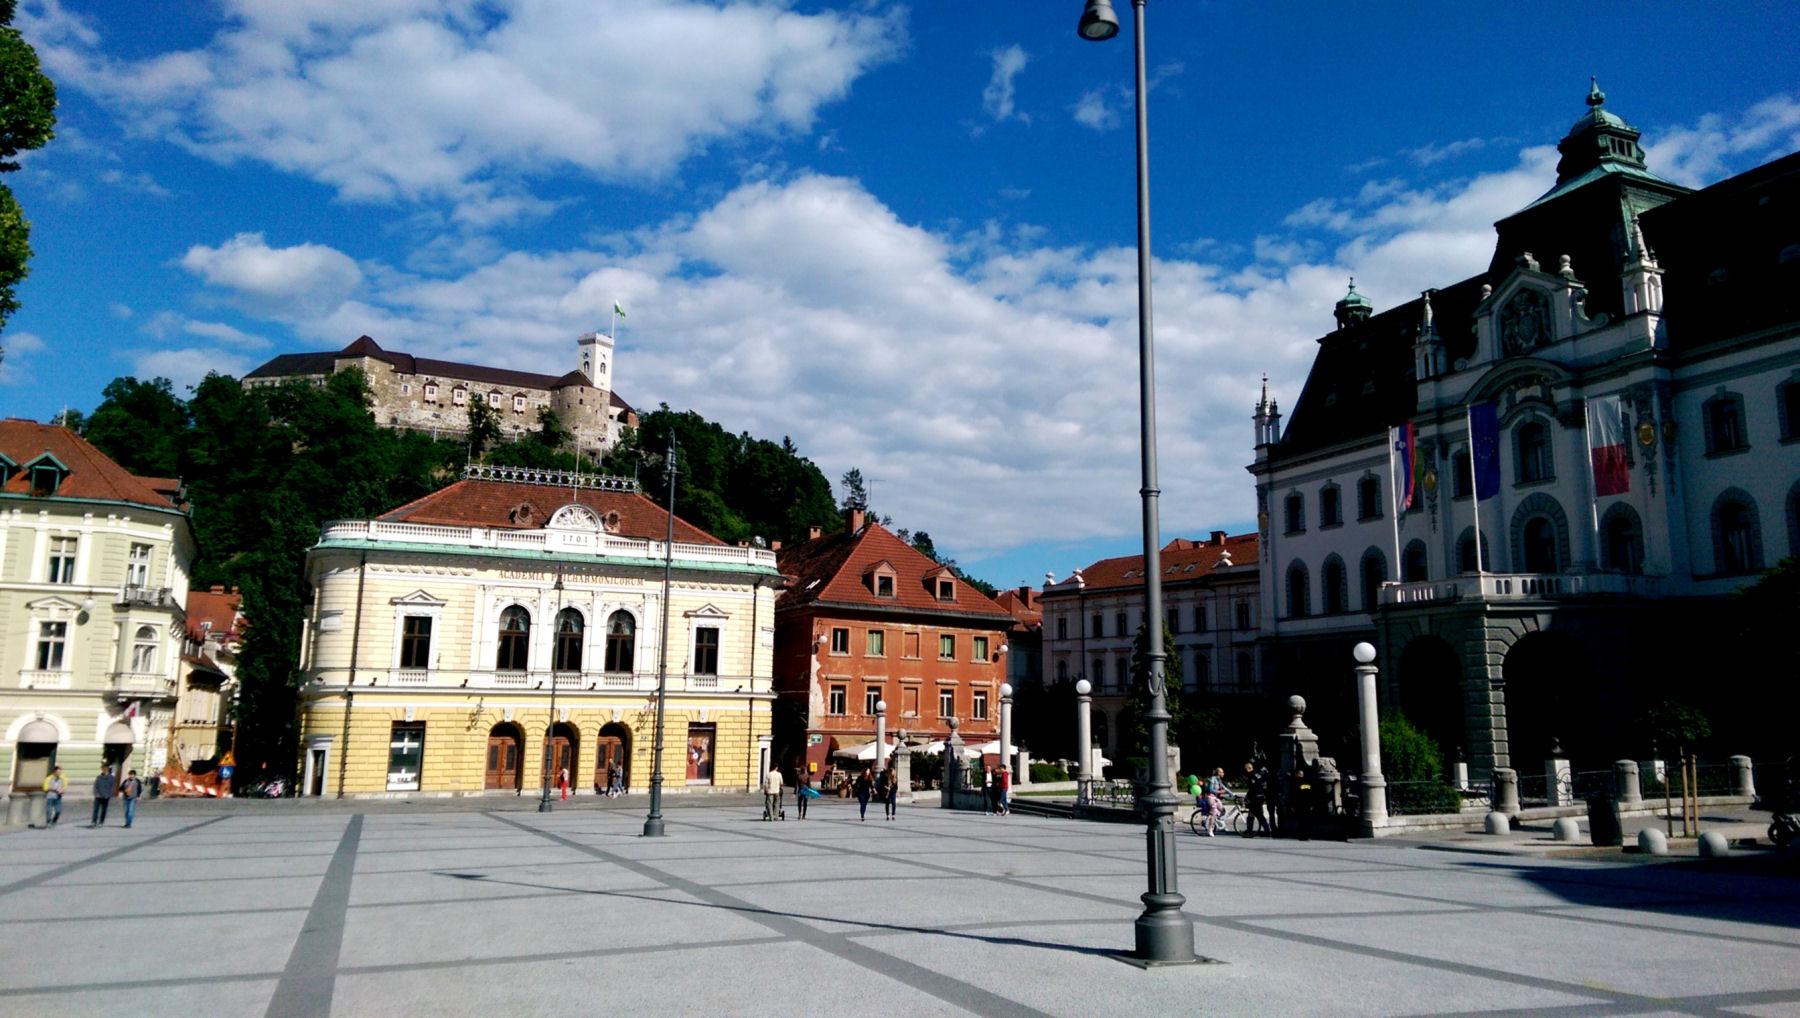 Ljubljana Congress Square, Slovenia